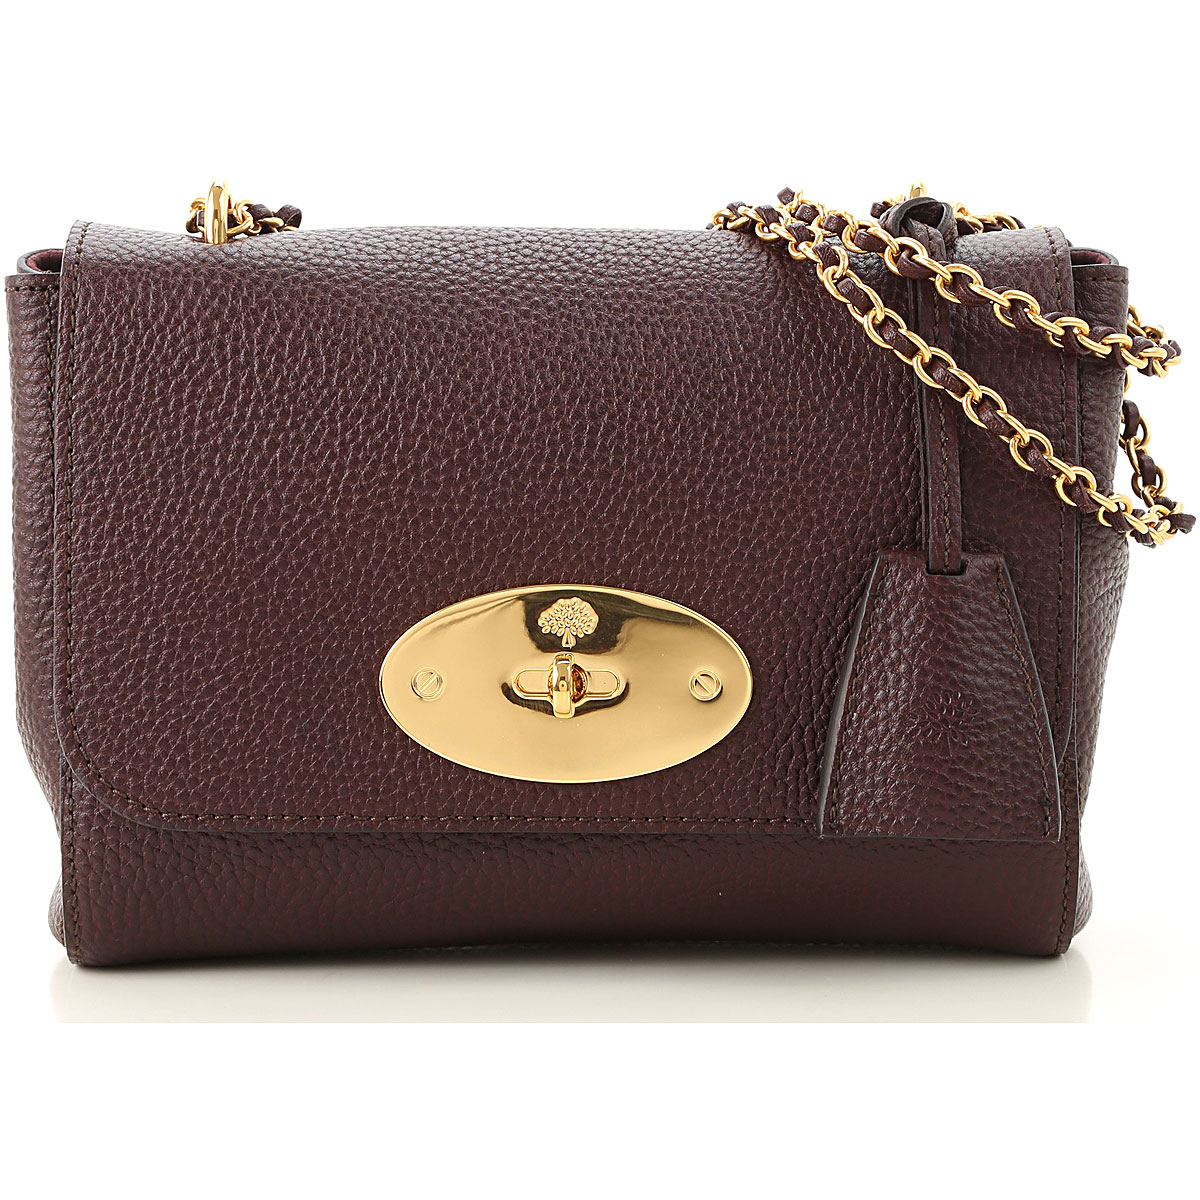 Mulberry Shoulder Bag for Women On Sale, oxblood, Leather, 2019